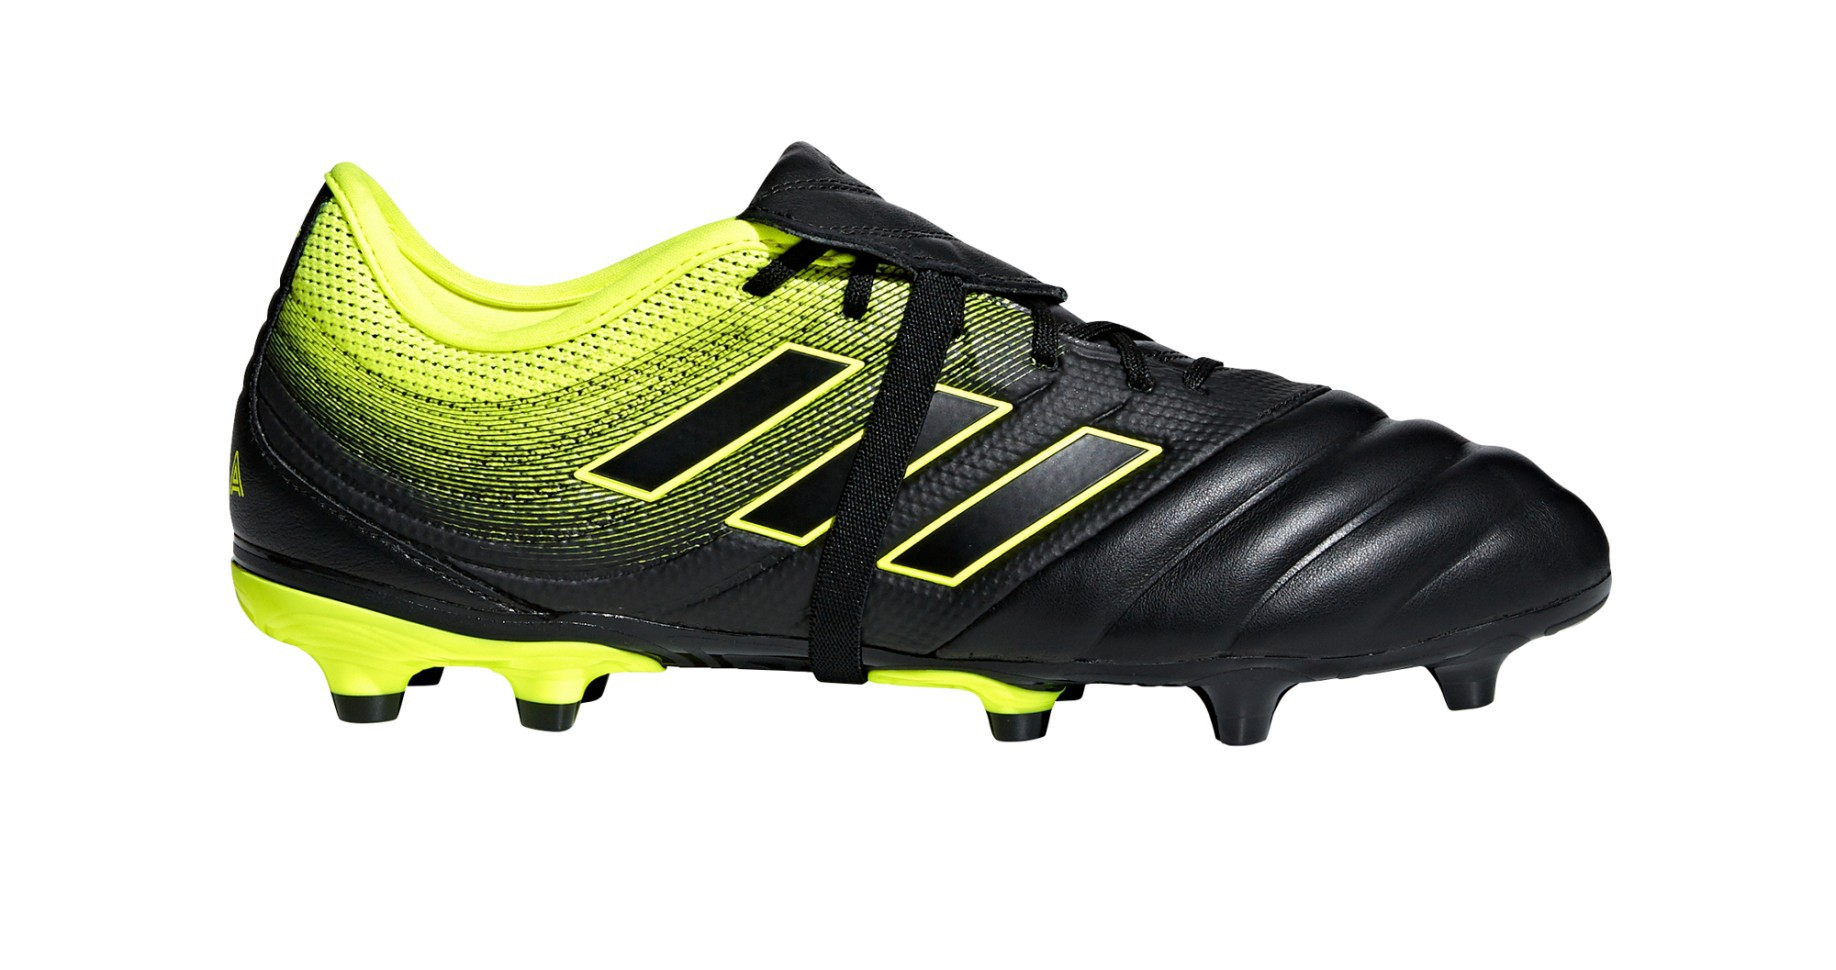 adidas full nero football boots